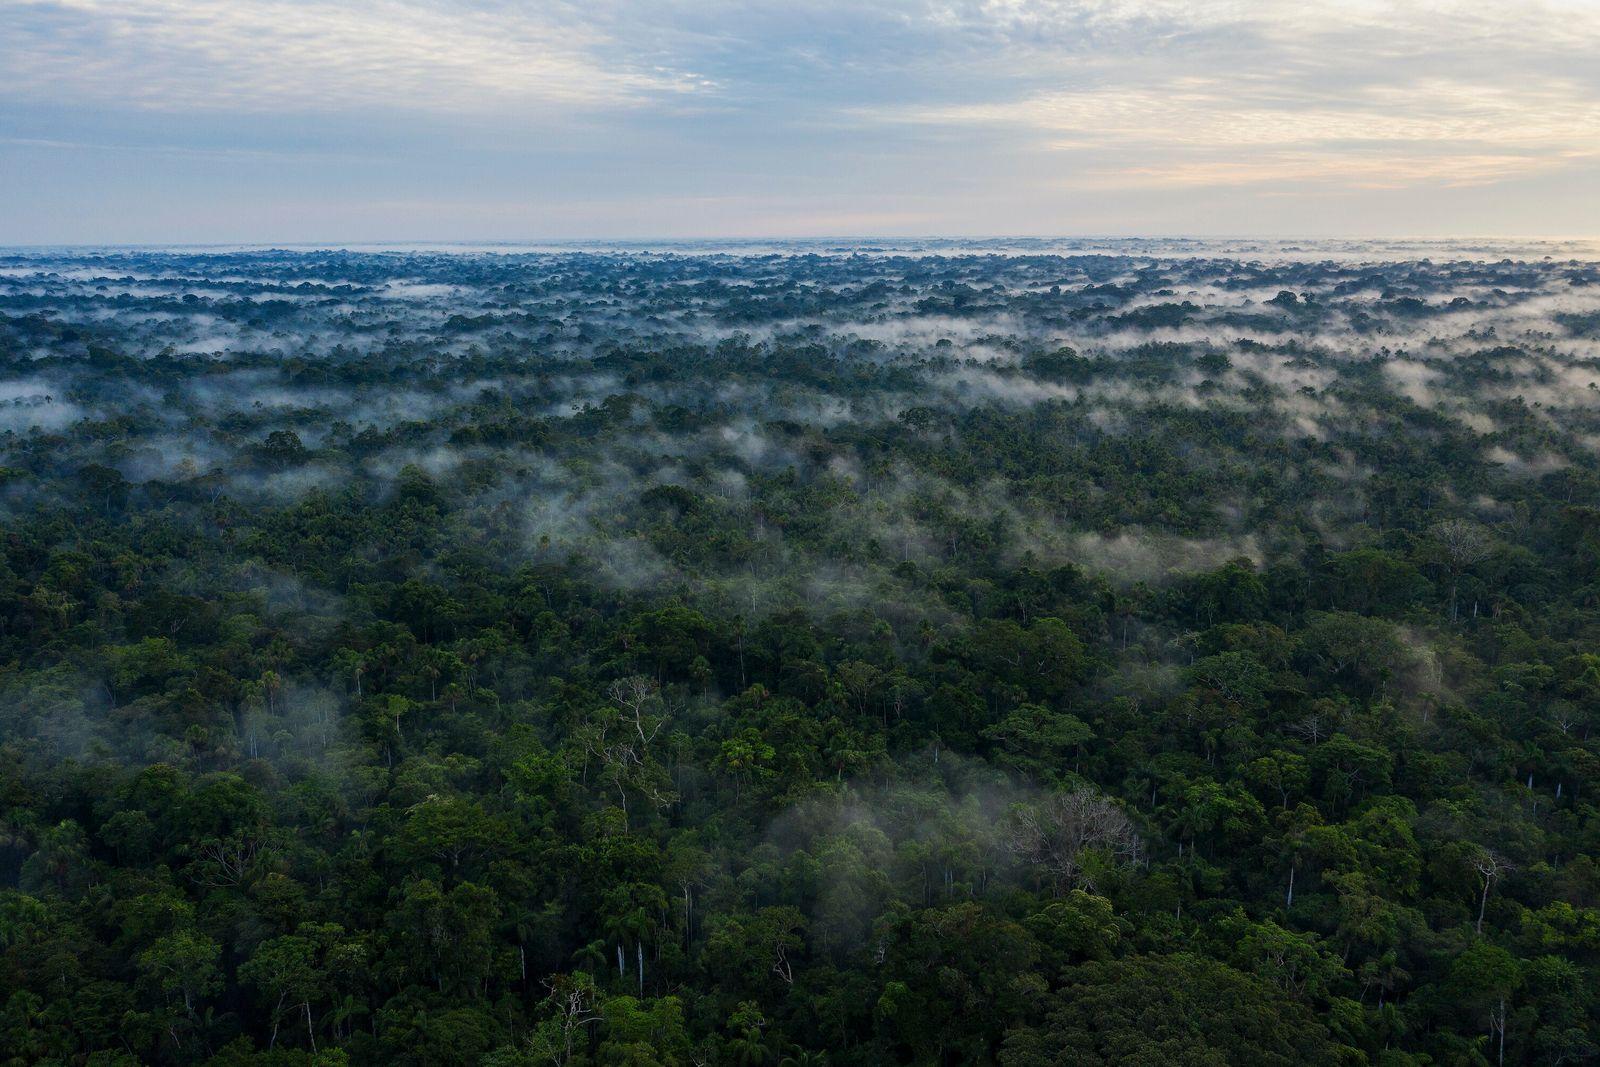 foto aérea da floresta amazônica